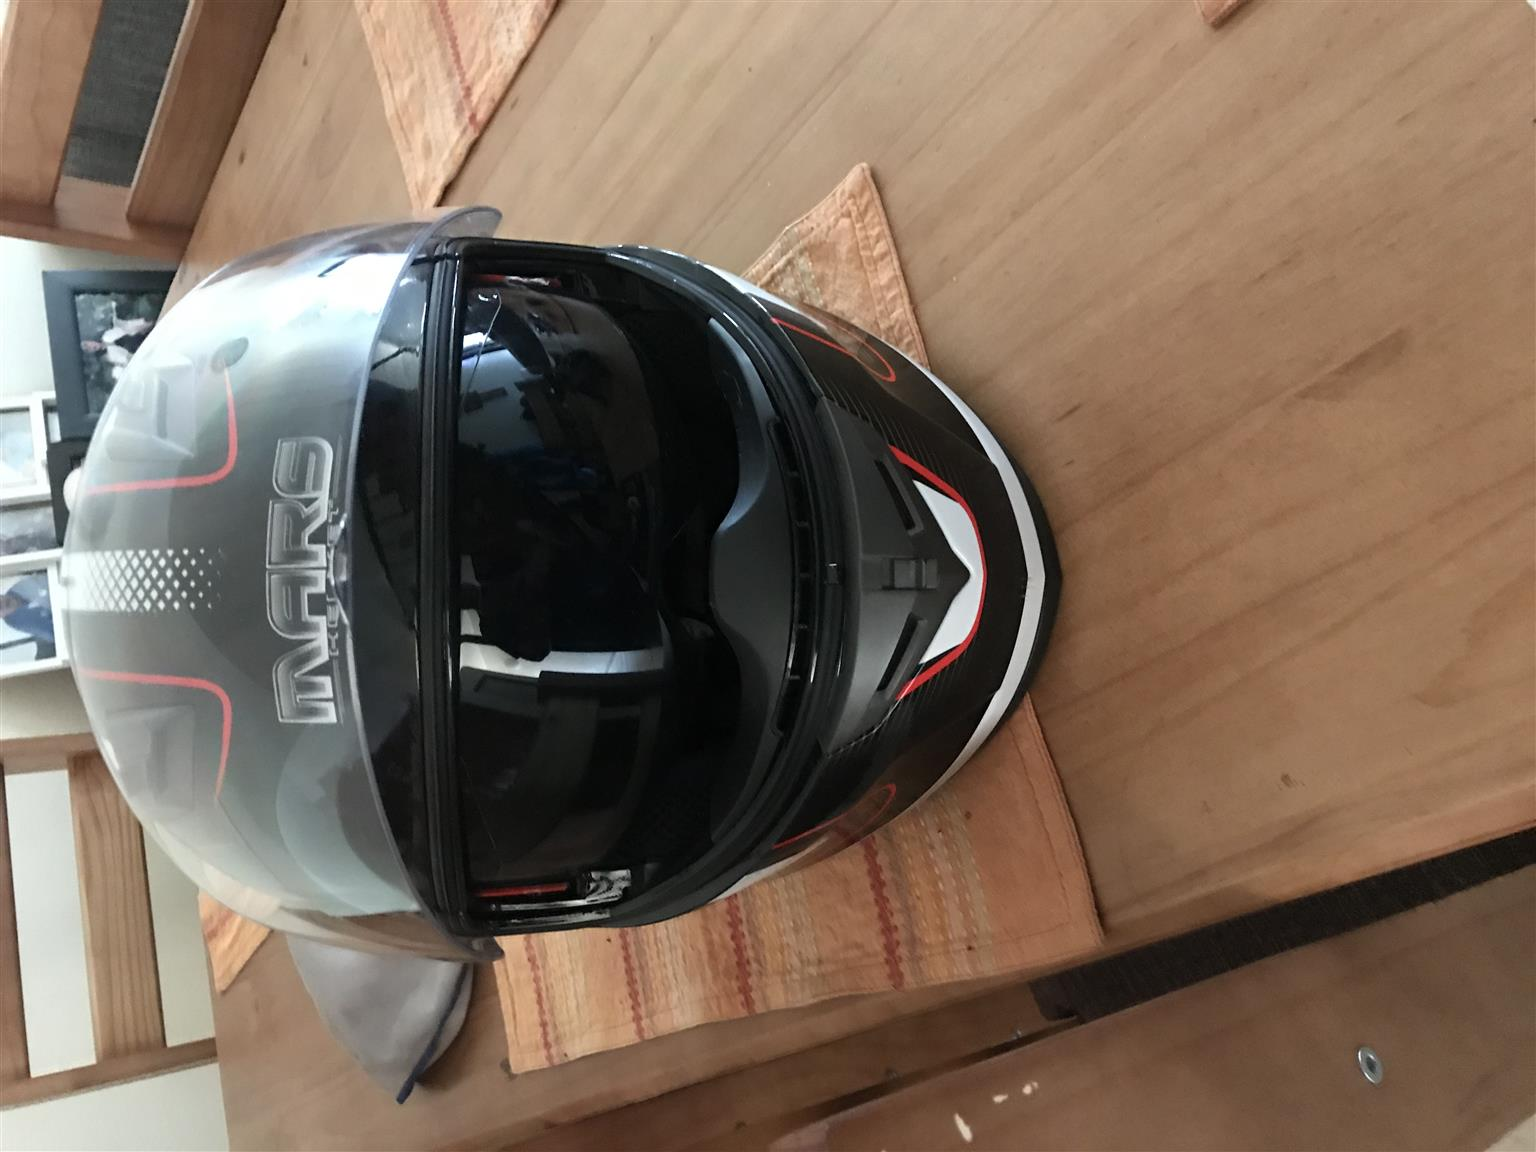 Shark helmet and protective jacket